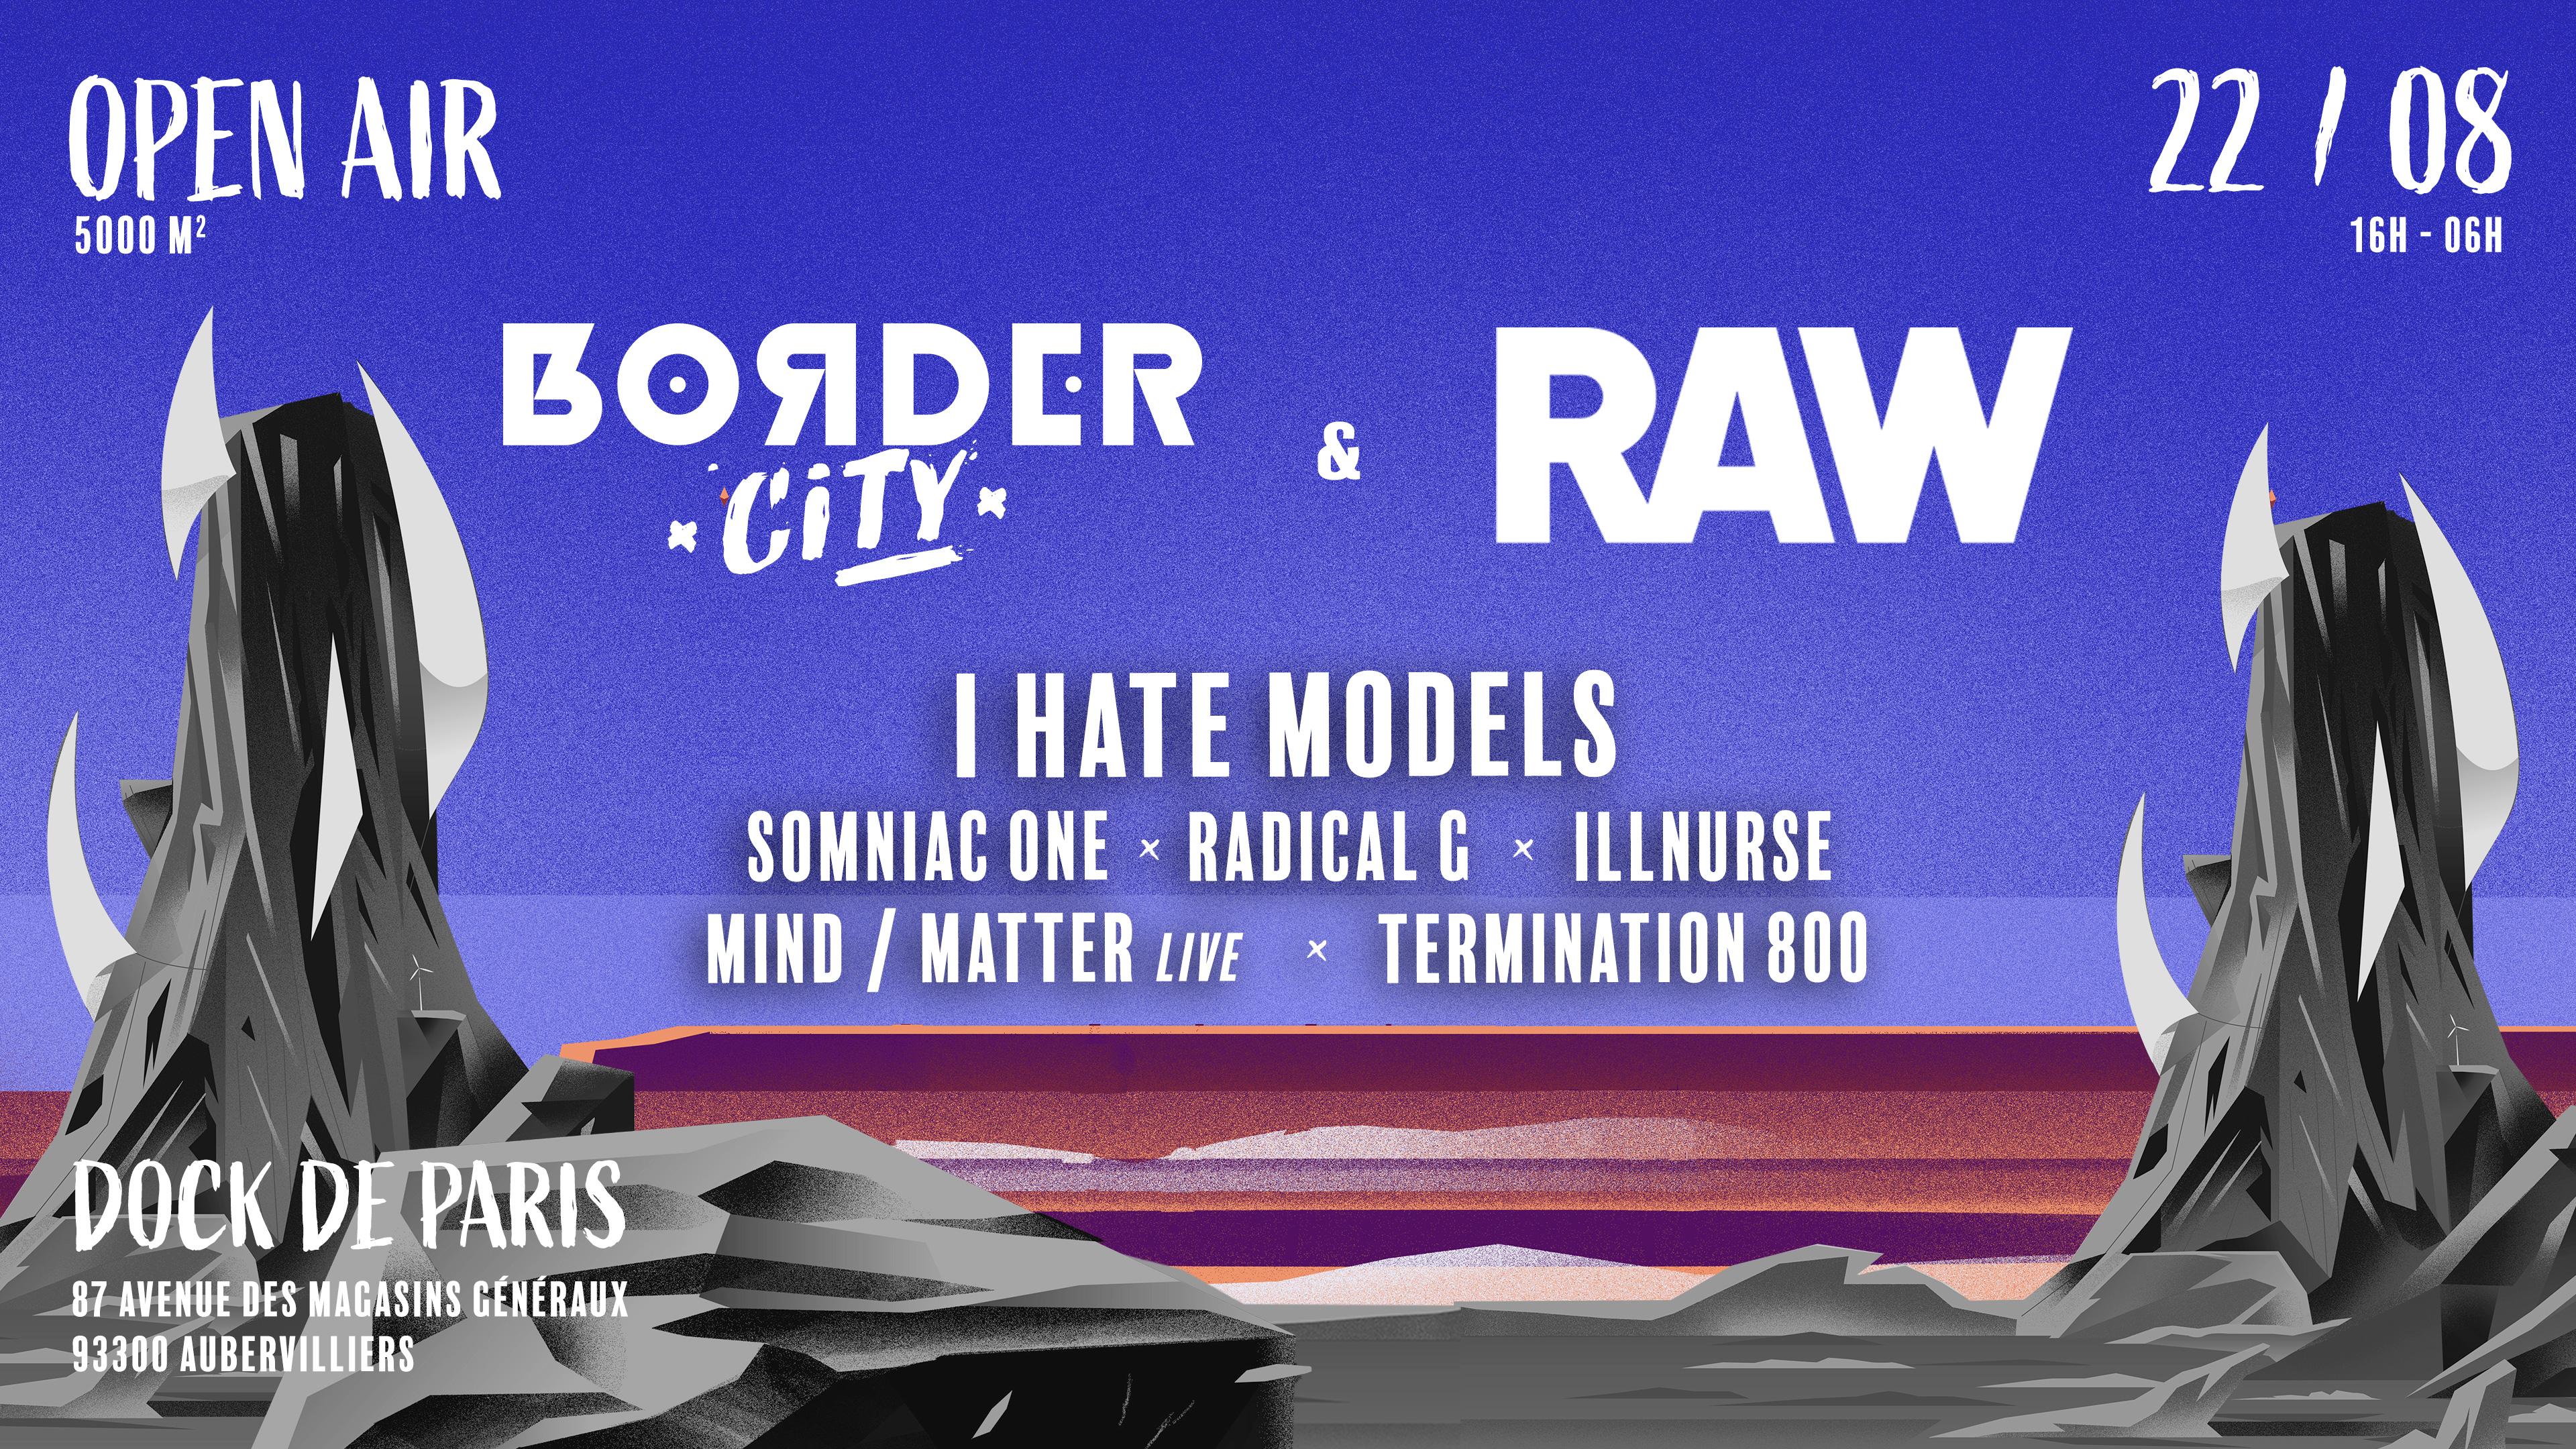 Border City x Raw w/ I Hate Models l Radical G l Illnurse